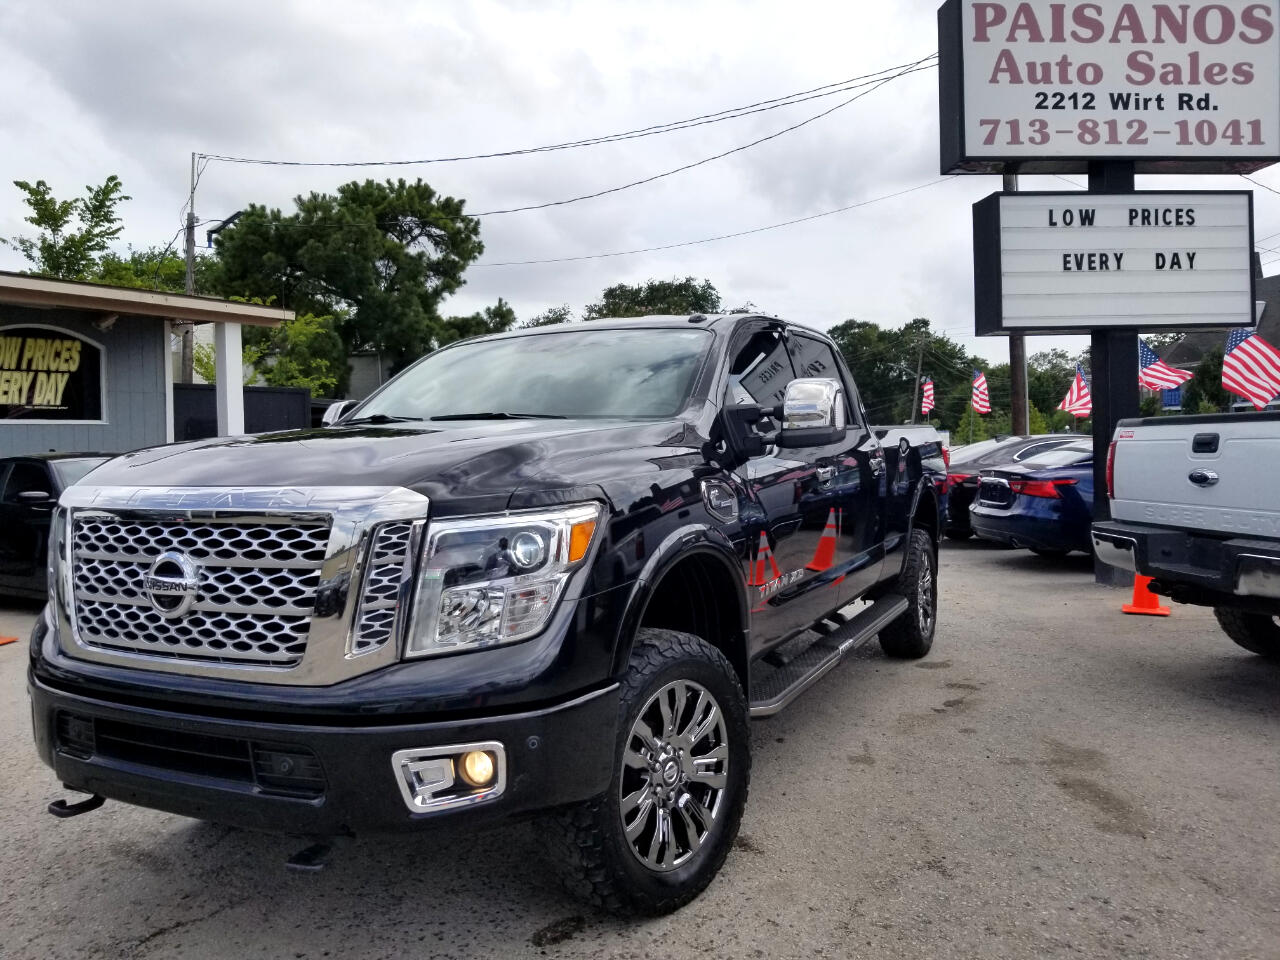 Paisanos Auto Sales >> Used Cars Houston Tx Used Cars Trucks Tx Paisanos Auto